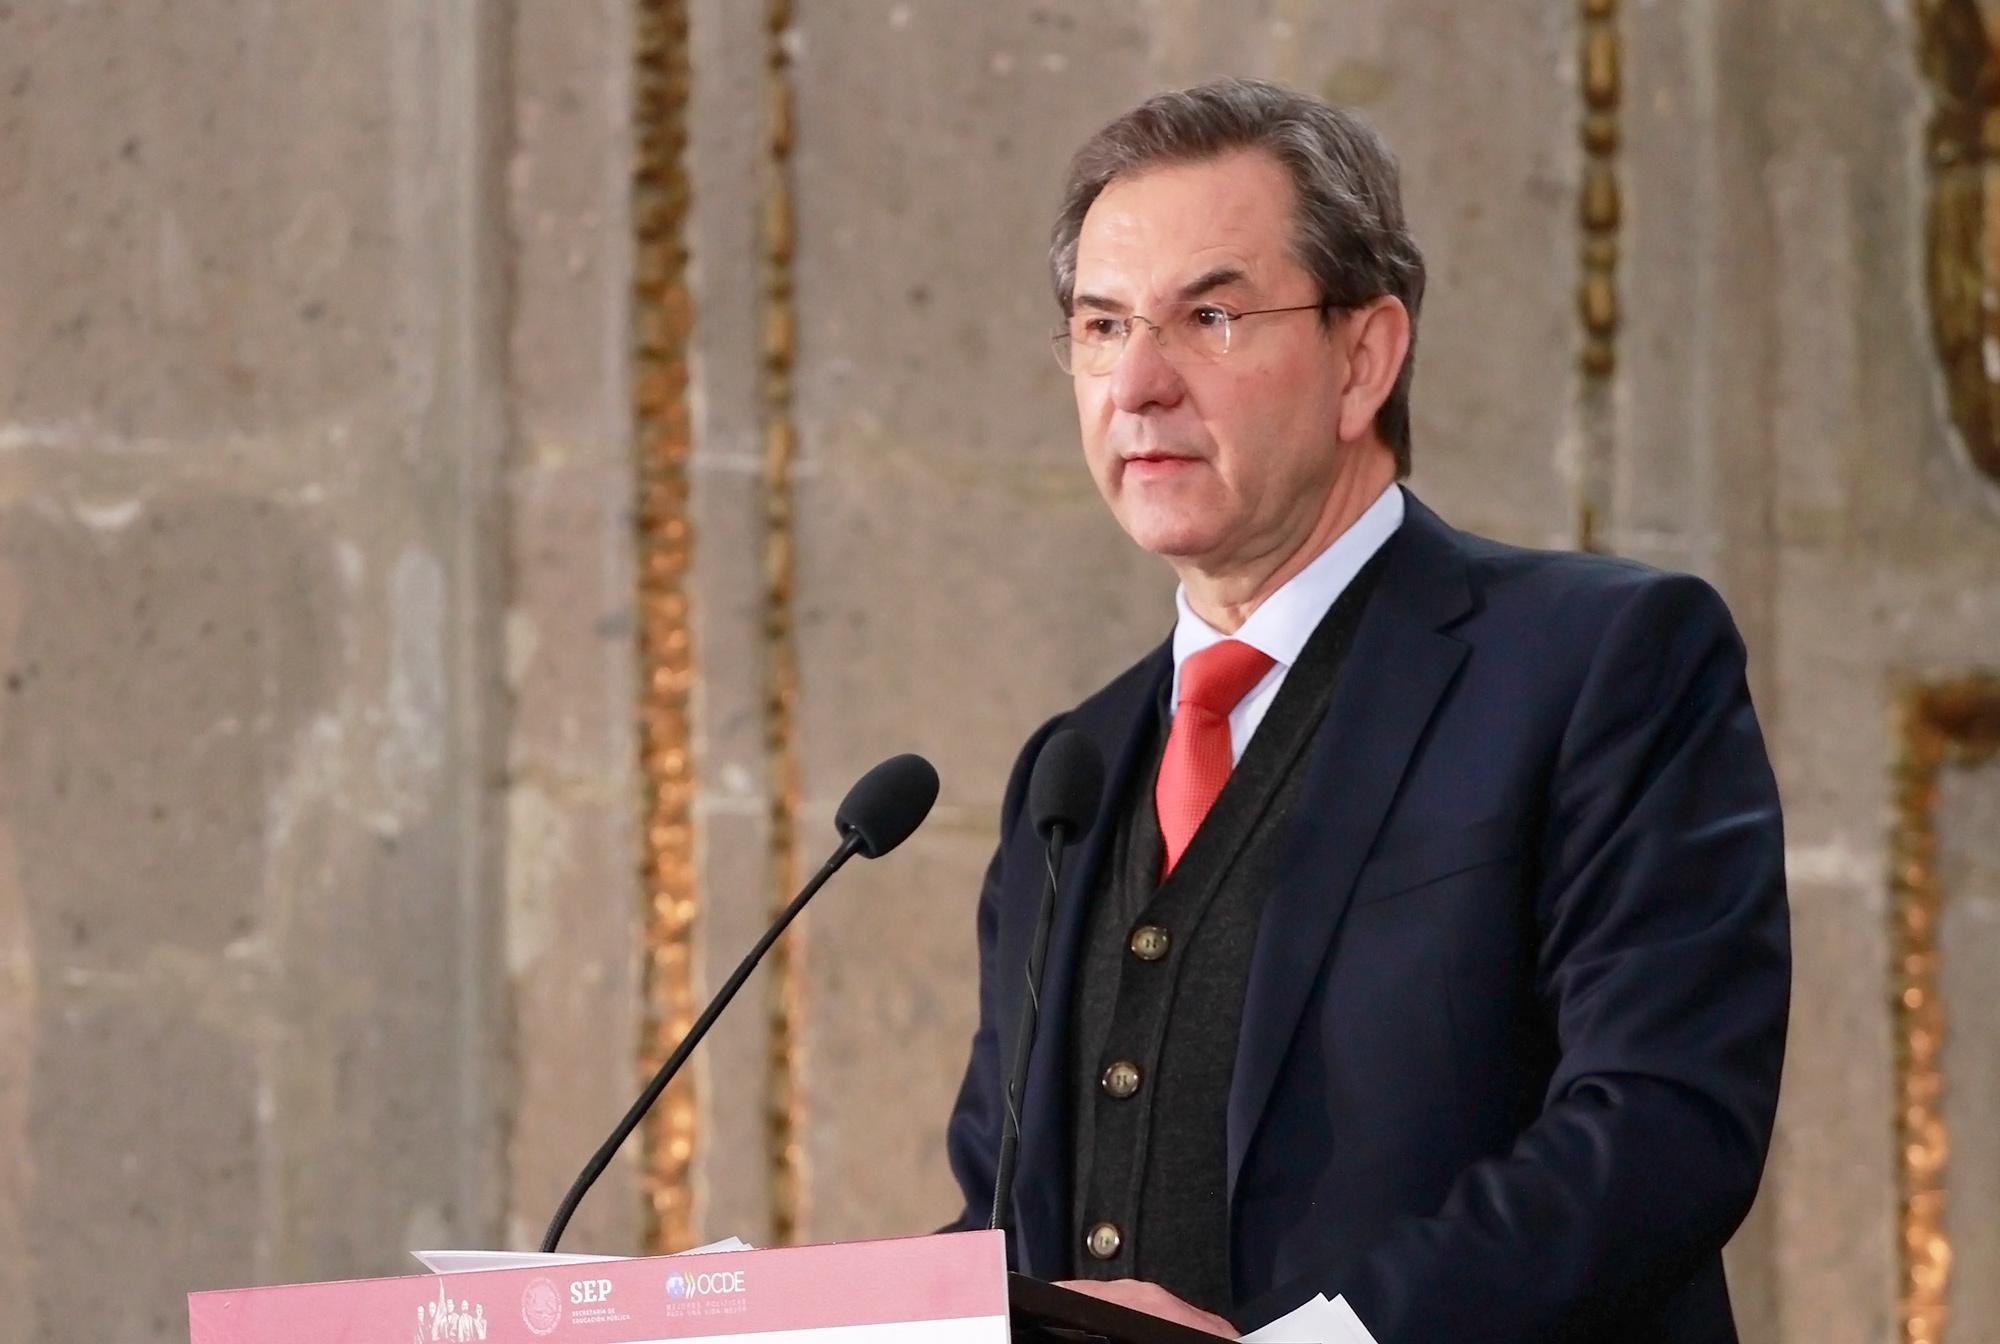 Ya es oficial; ratifican a Esteban Moctezuma como embajador de México en EU